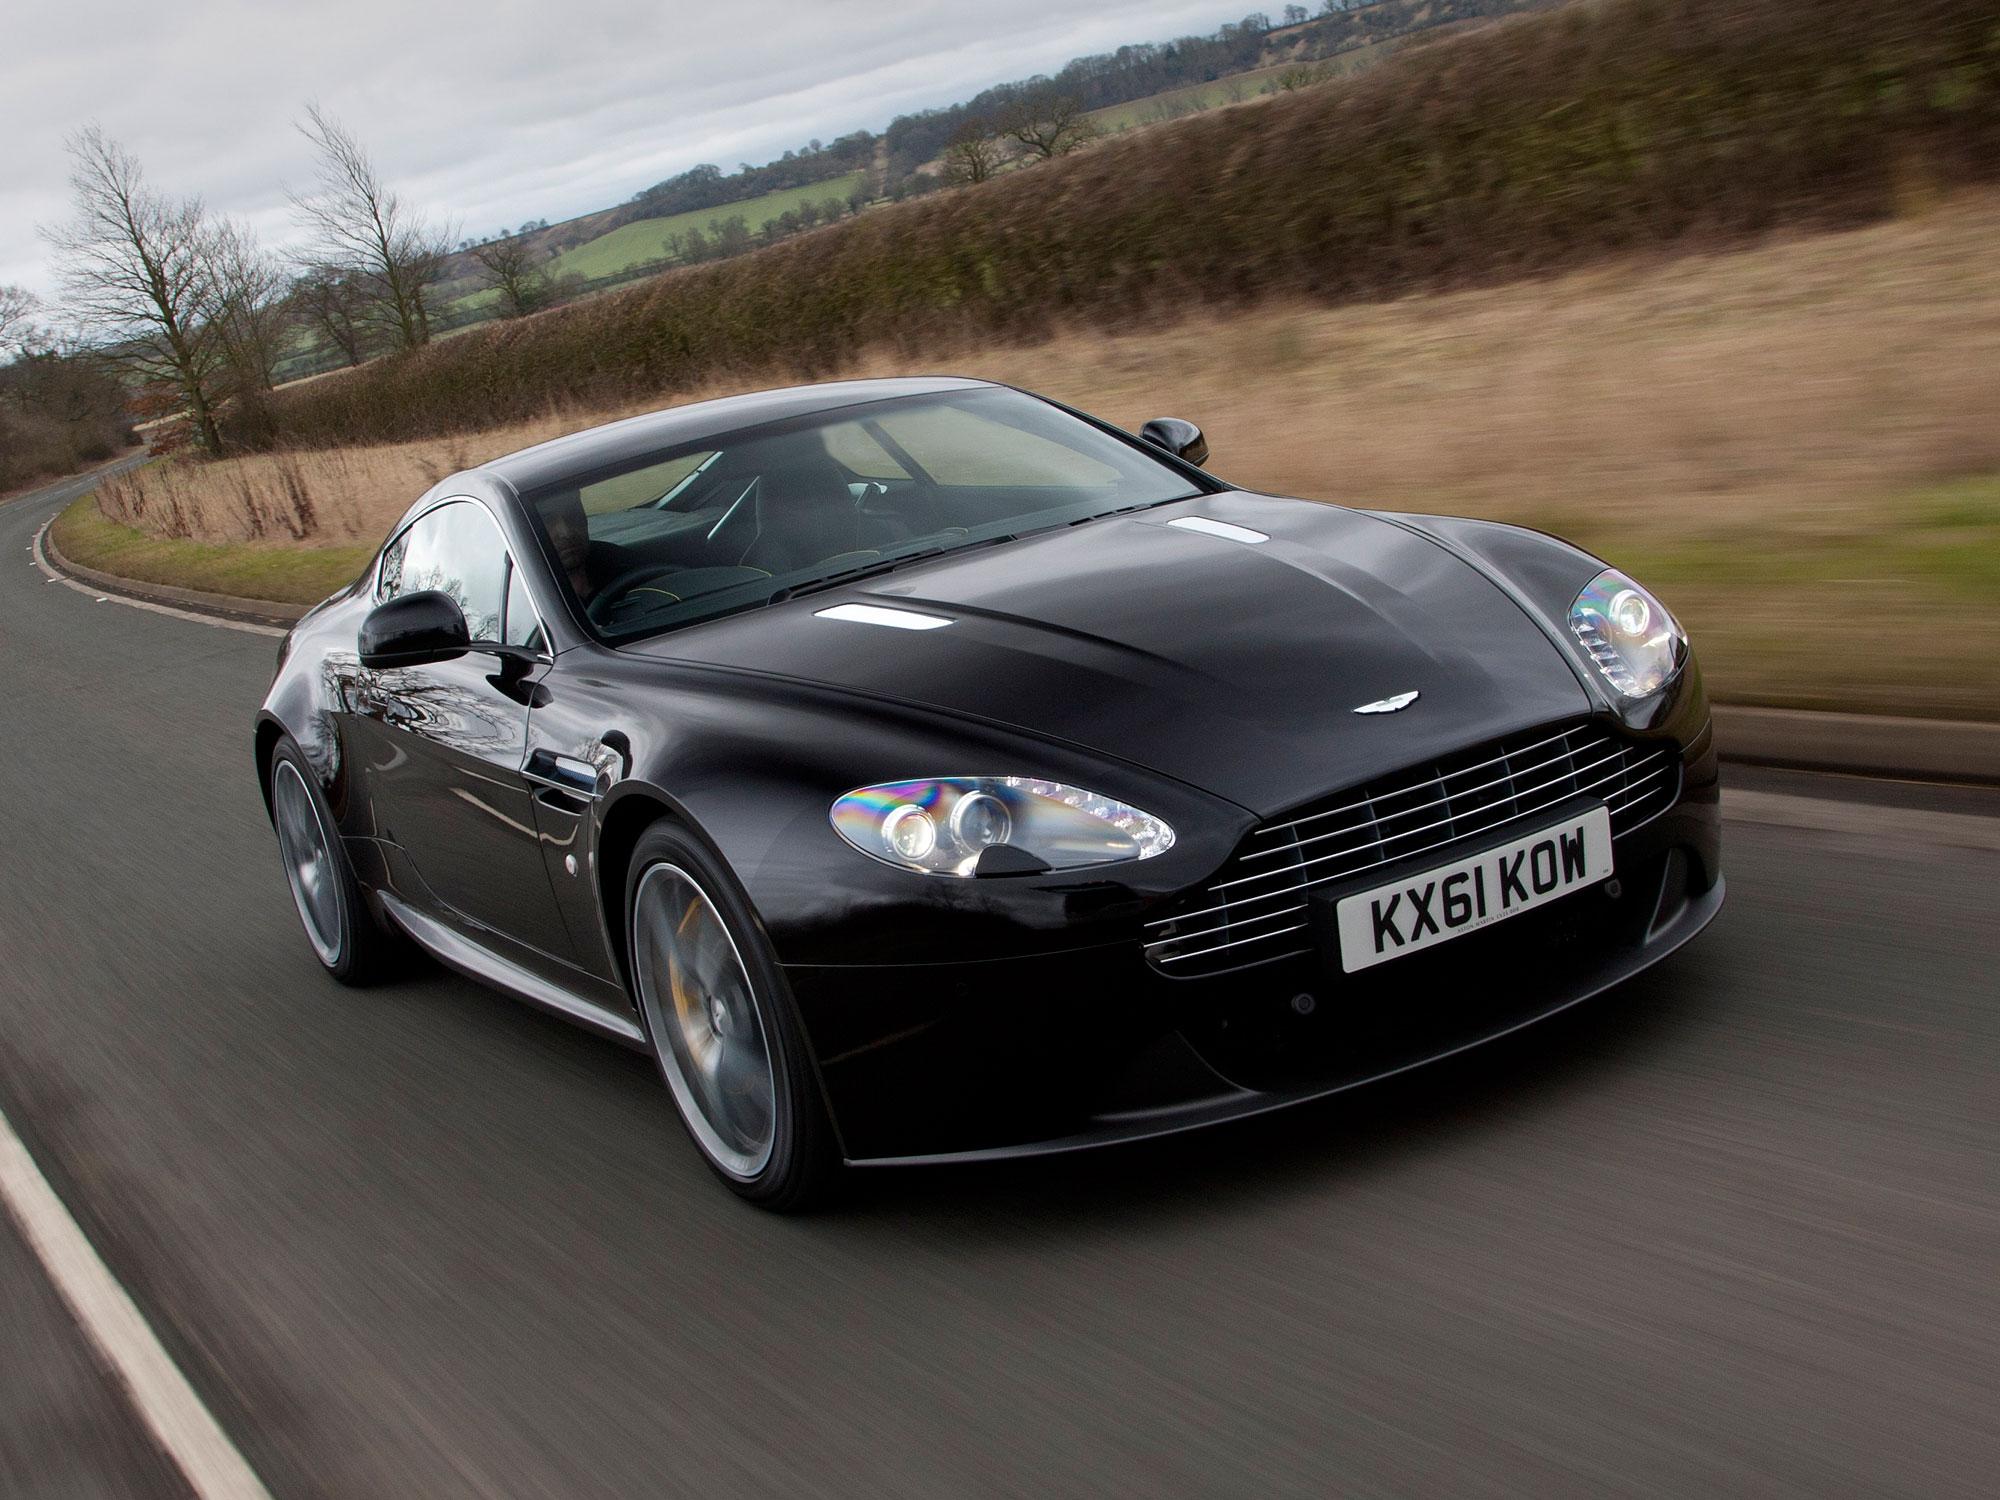 Aston Martin V8 Vantage 2012 Im Fahrbericht Autozeitung De